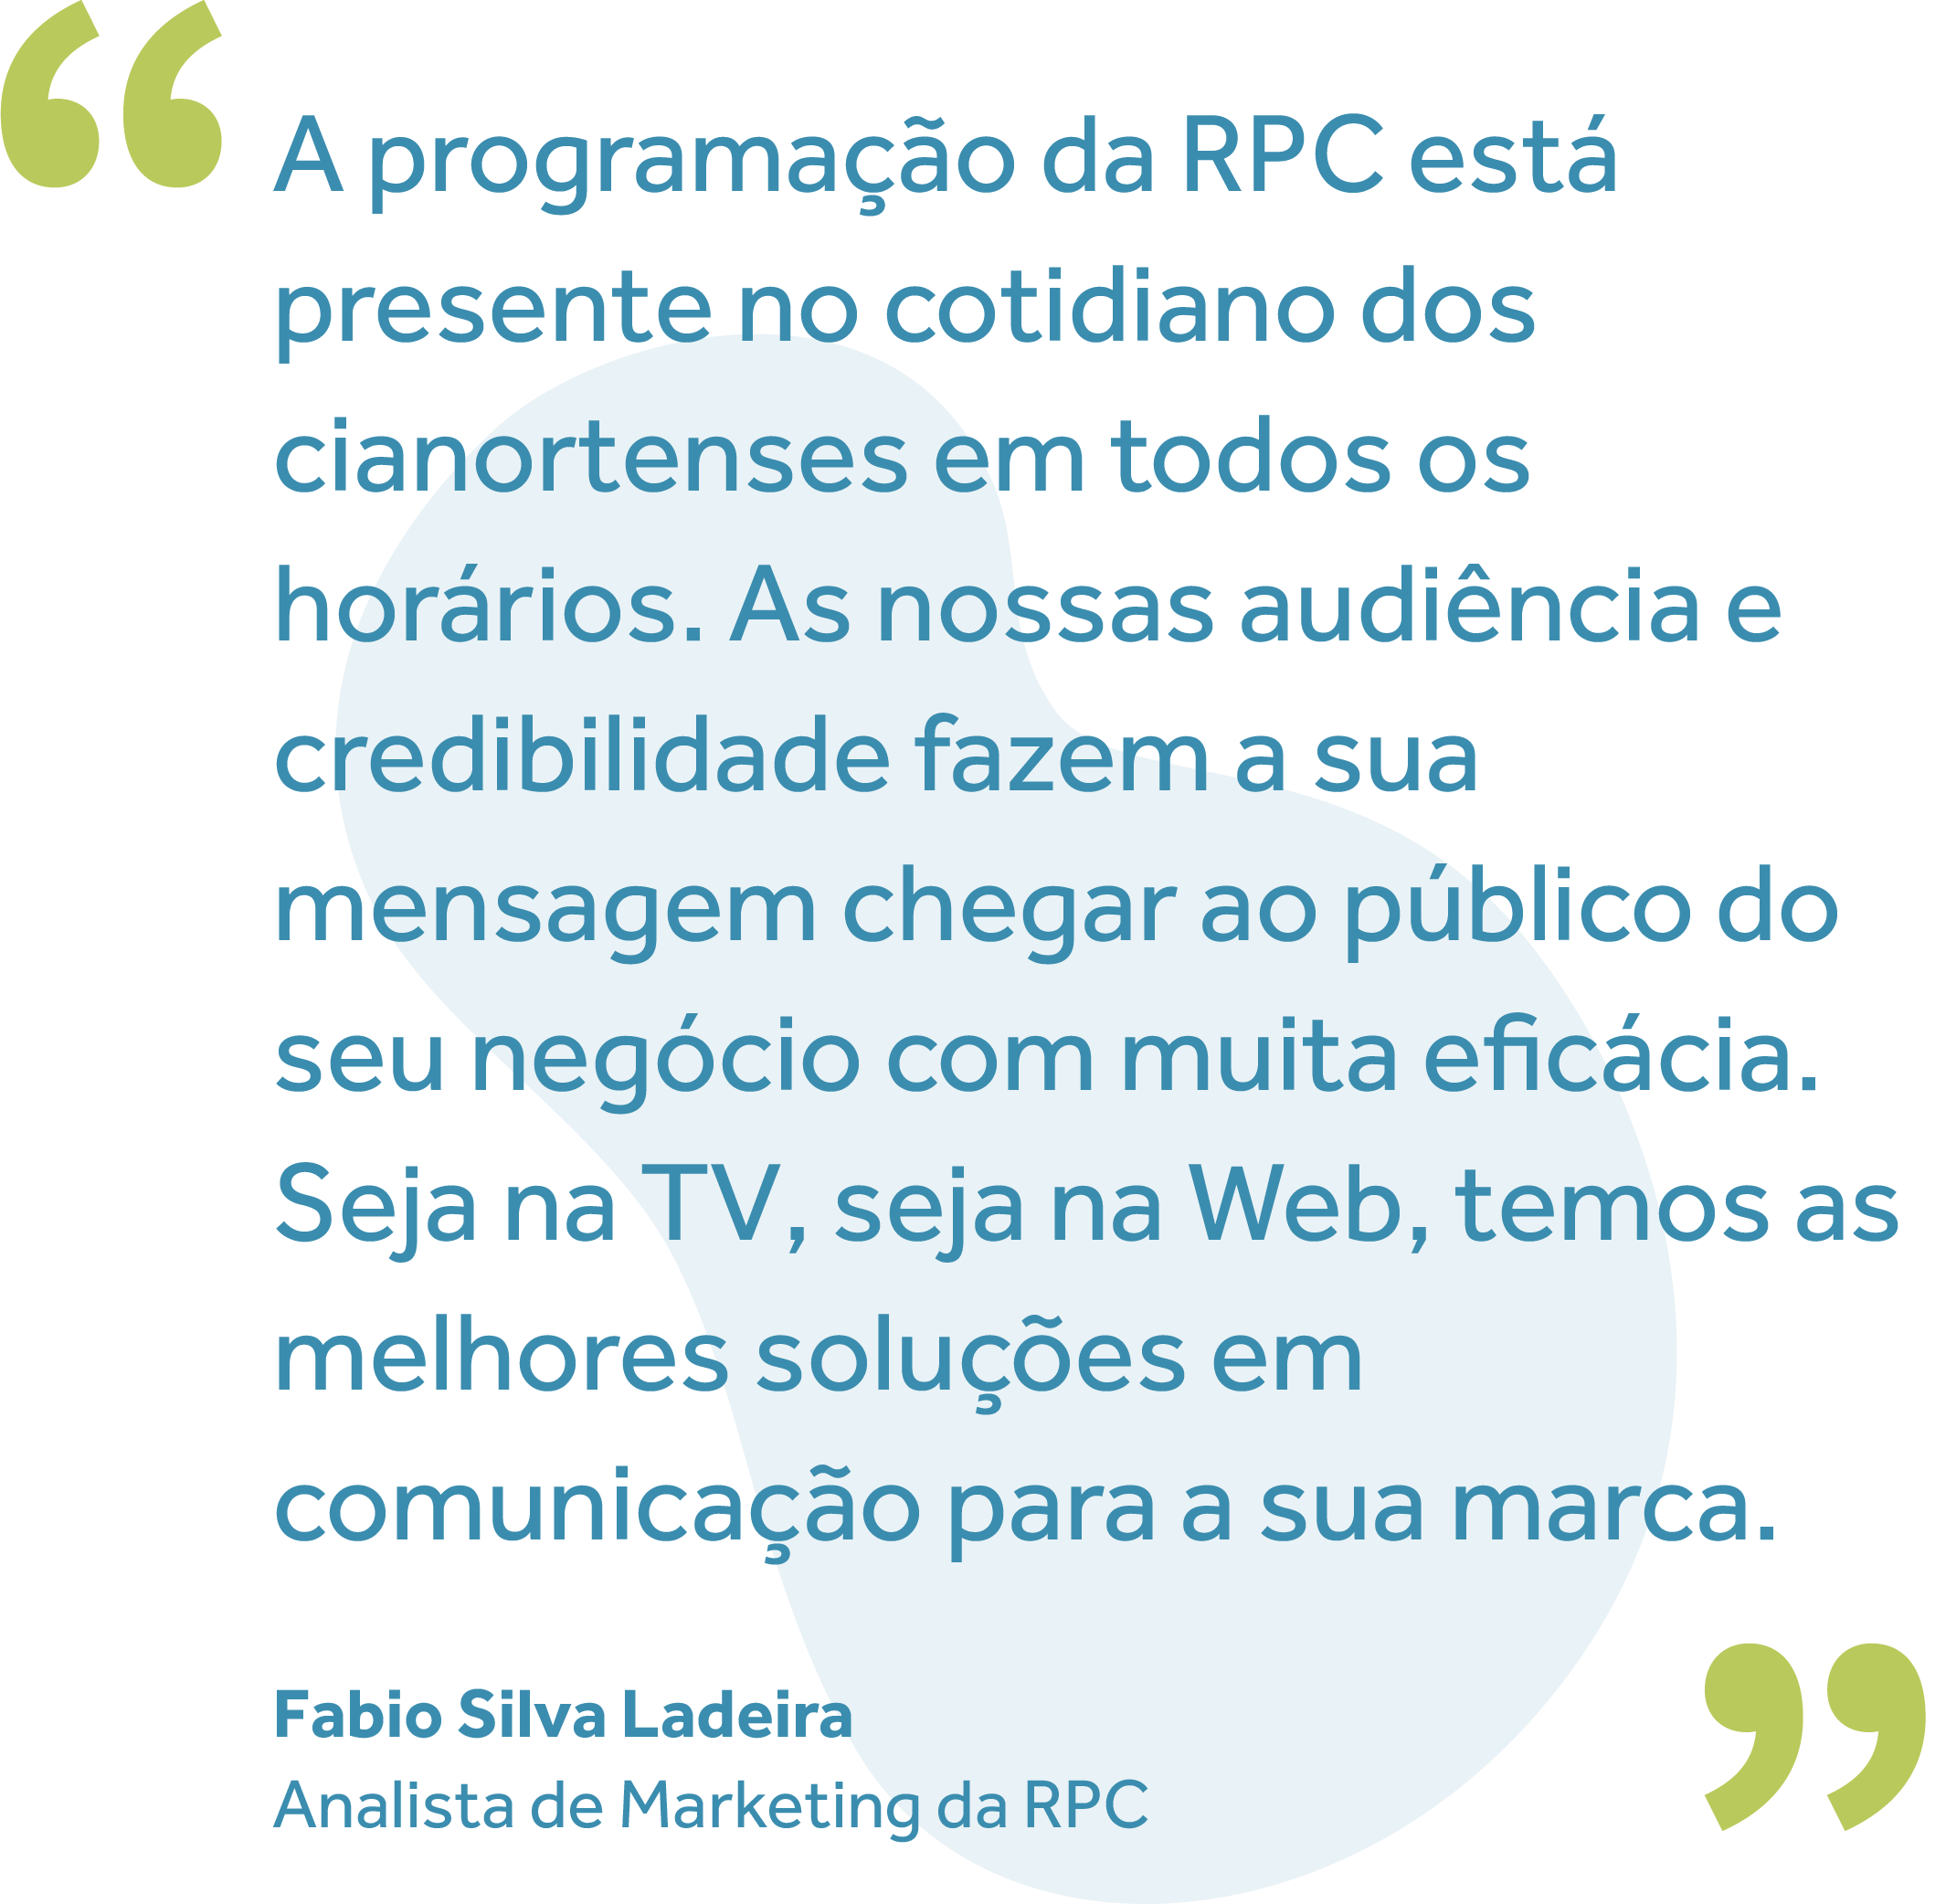 Depoimento Fábio Silva Ladeira